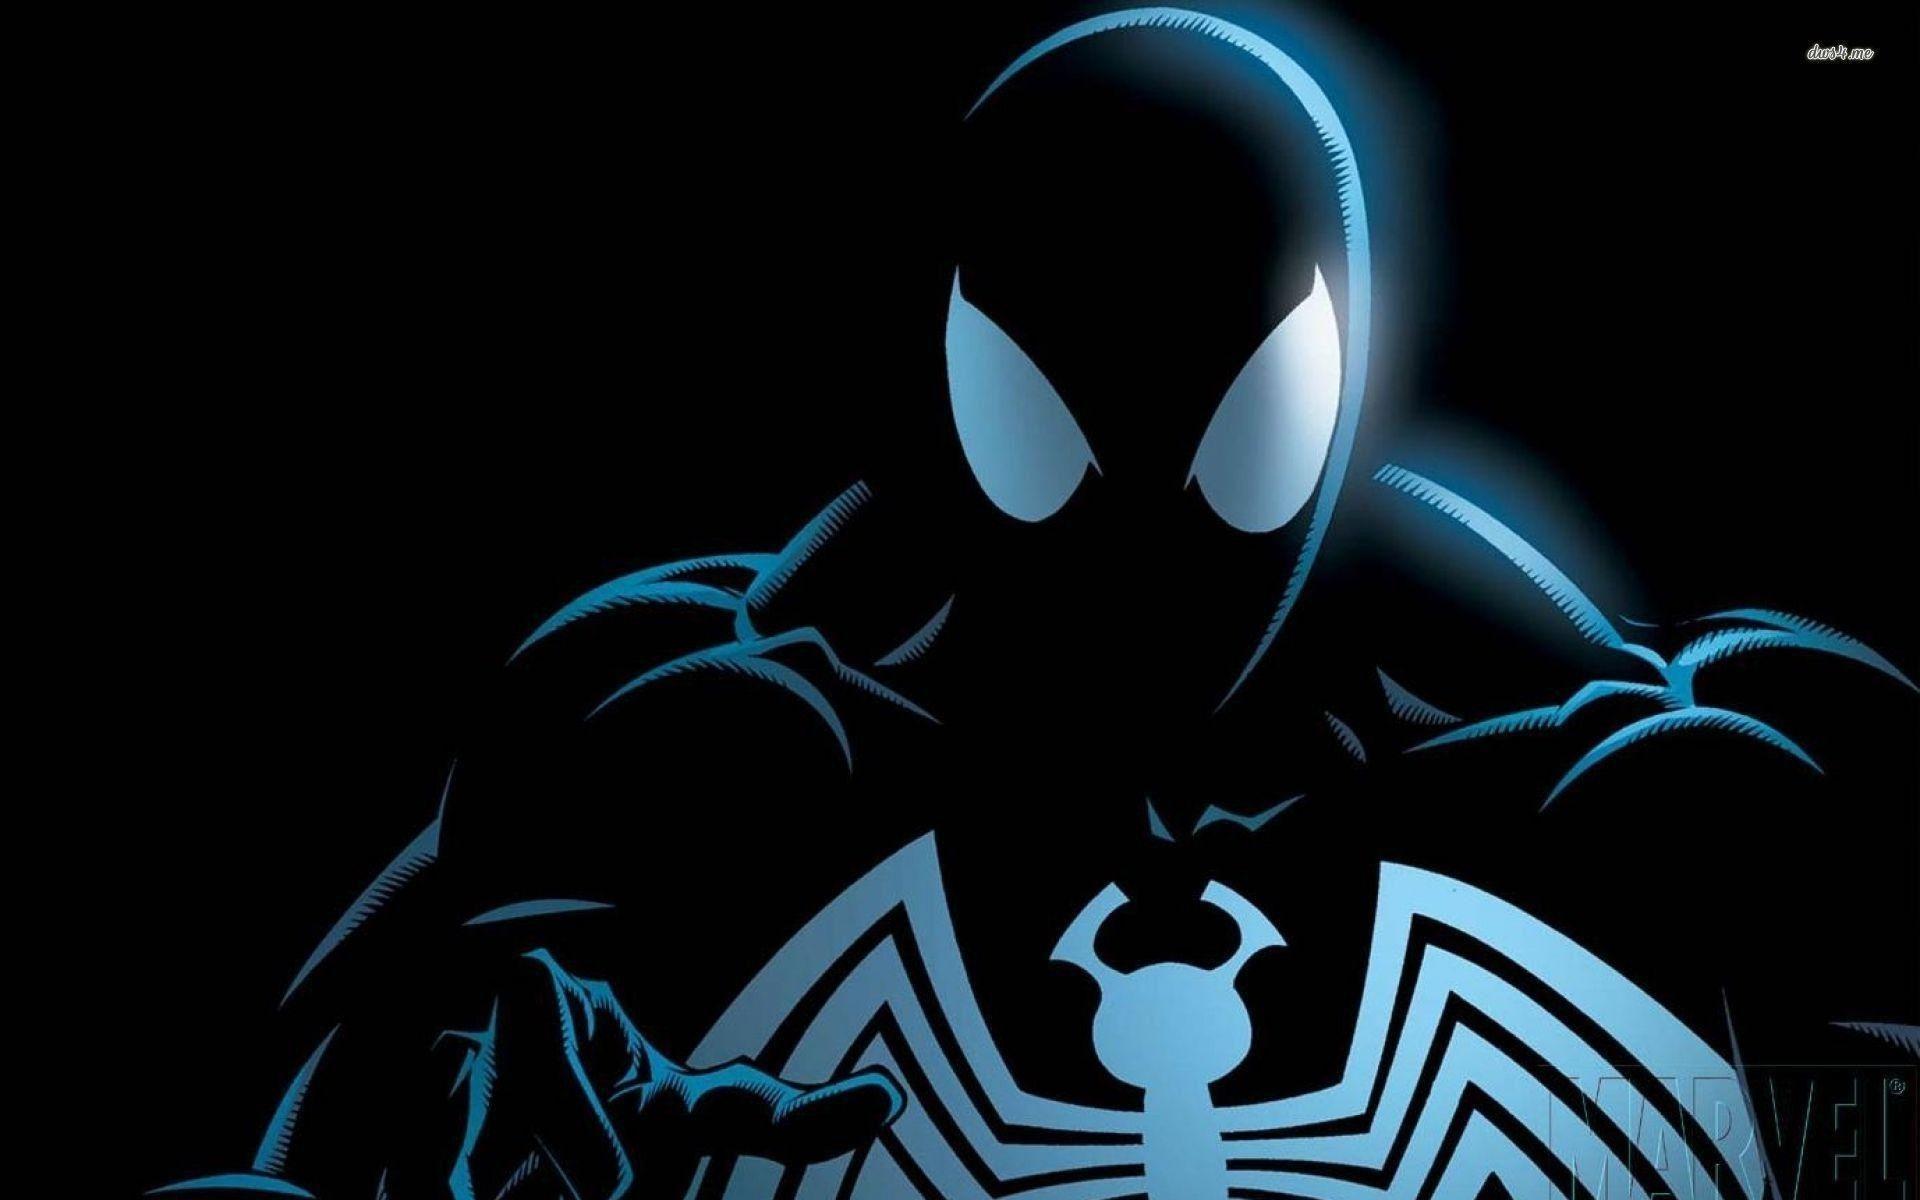 Black Suit Spiderman Spiderman Comic Black Spiderman Symbiote Spiderman